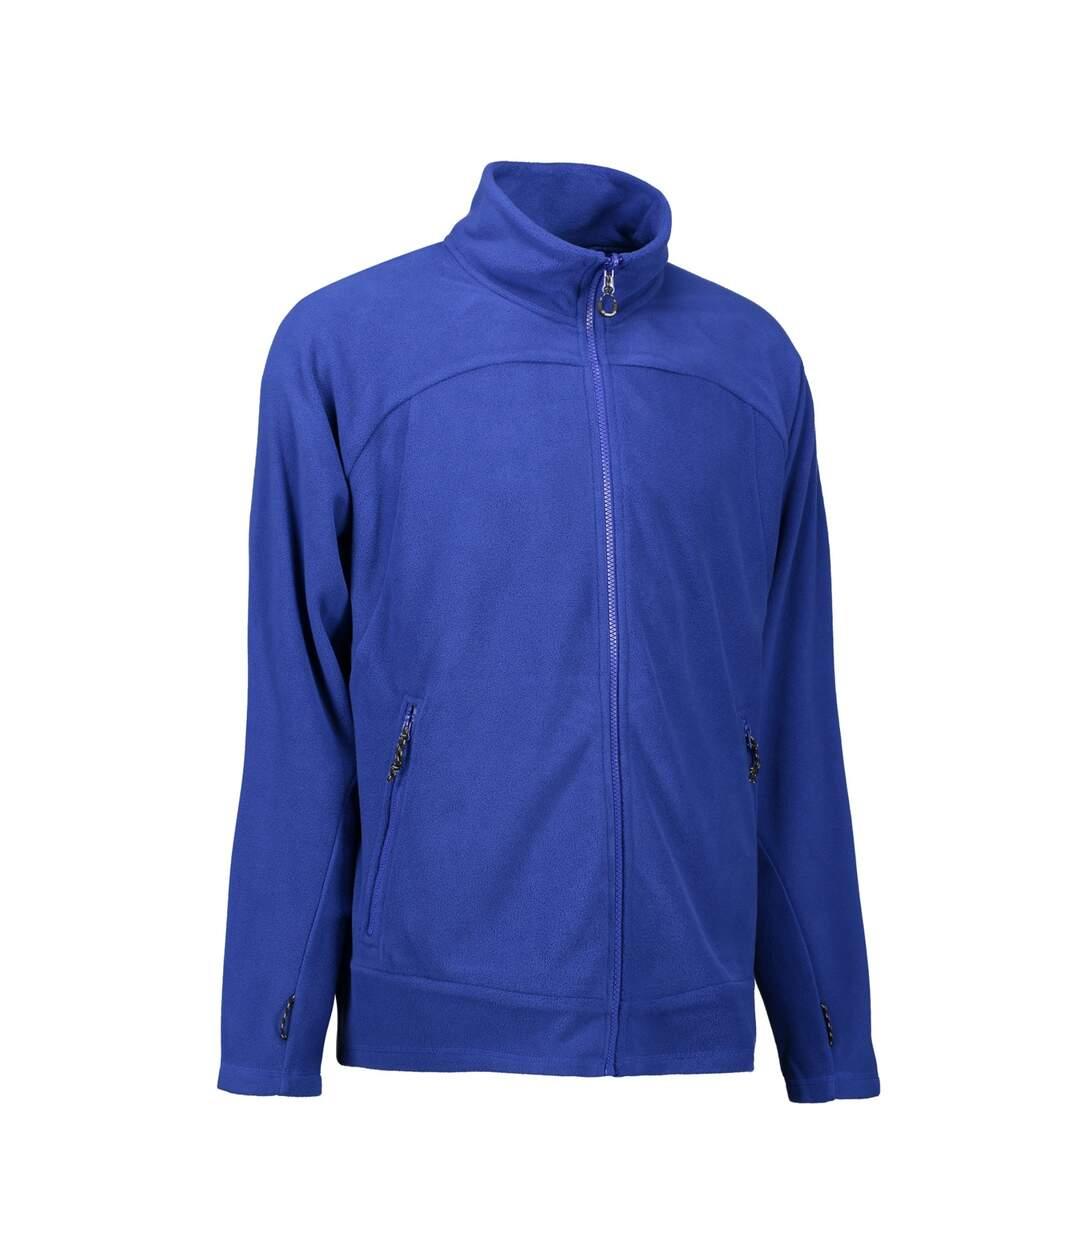 ID Mens Zip N Mix Active Fleece Jacket (Royal Blue) - UTID425